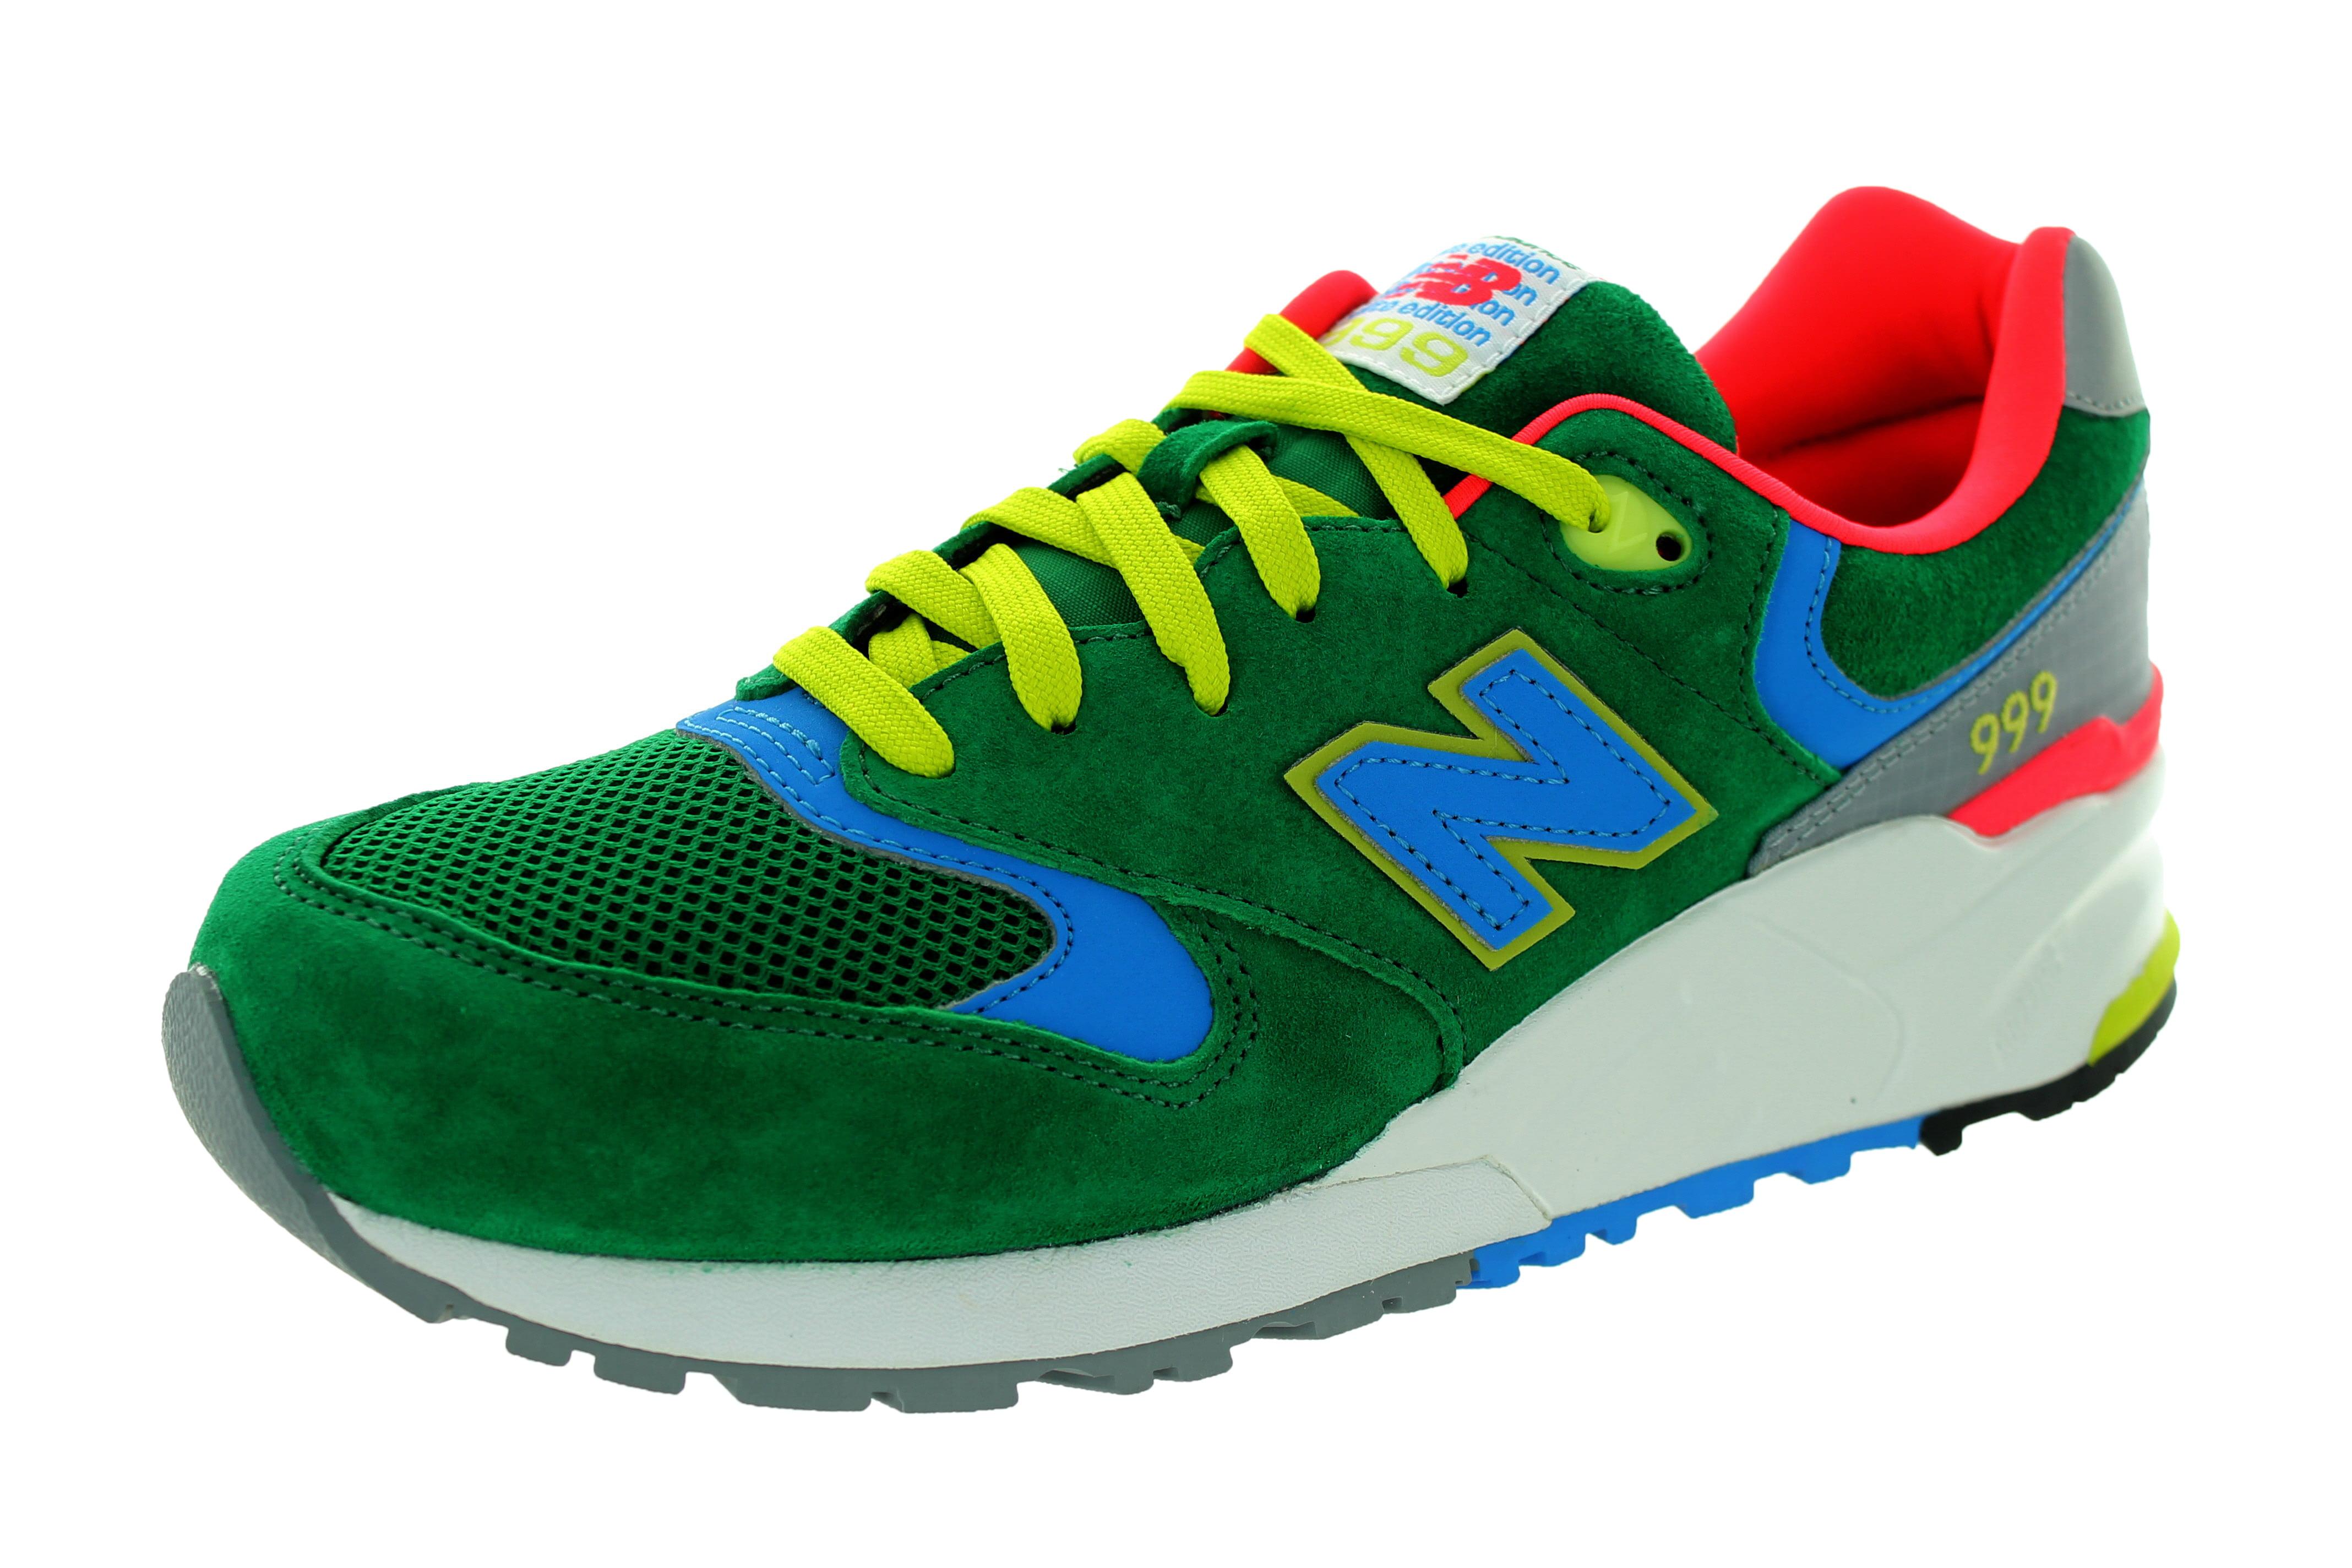 New Balance Men's 999 Classics Running Shoe by New Balance